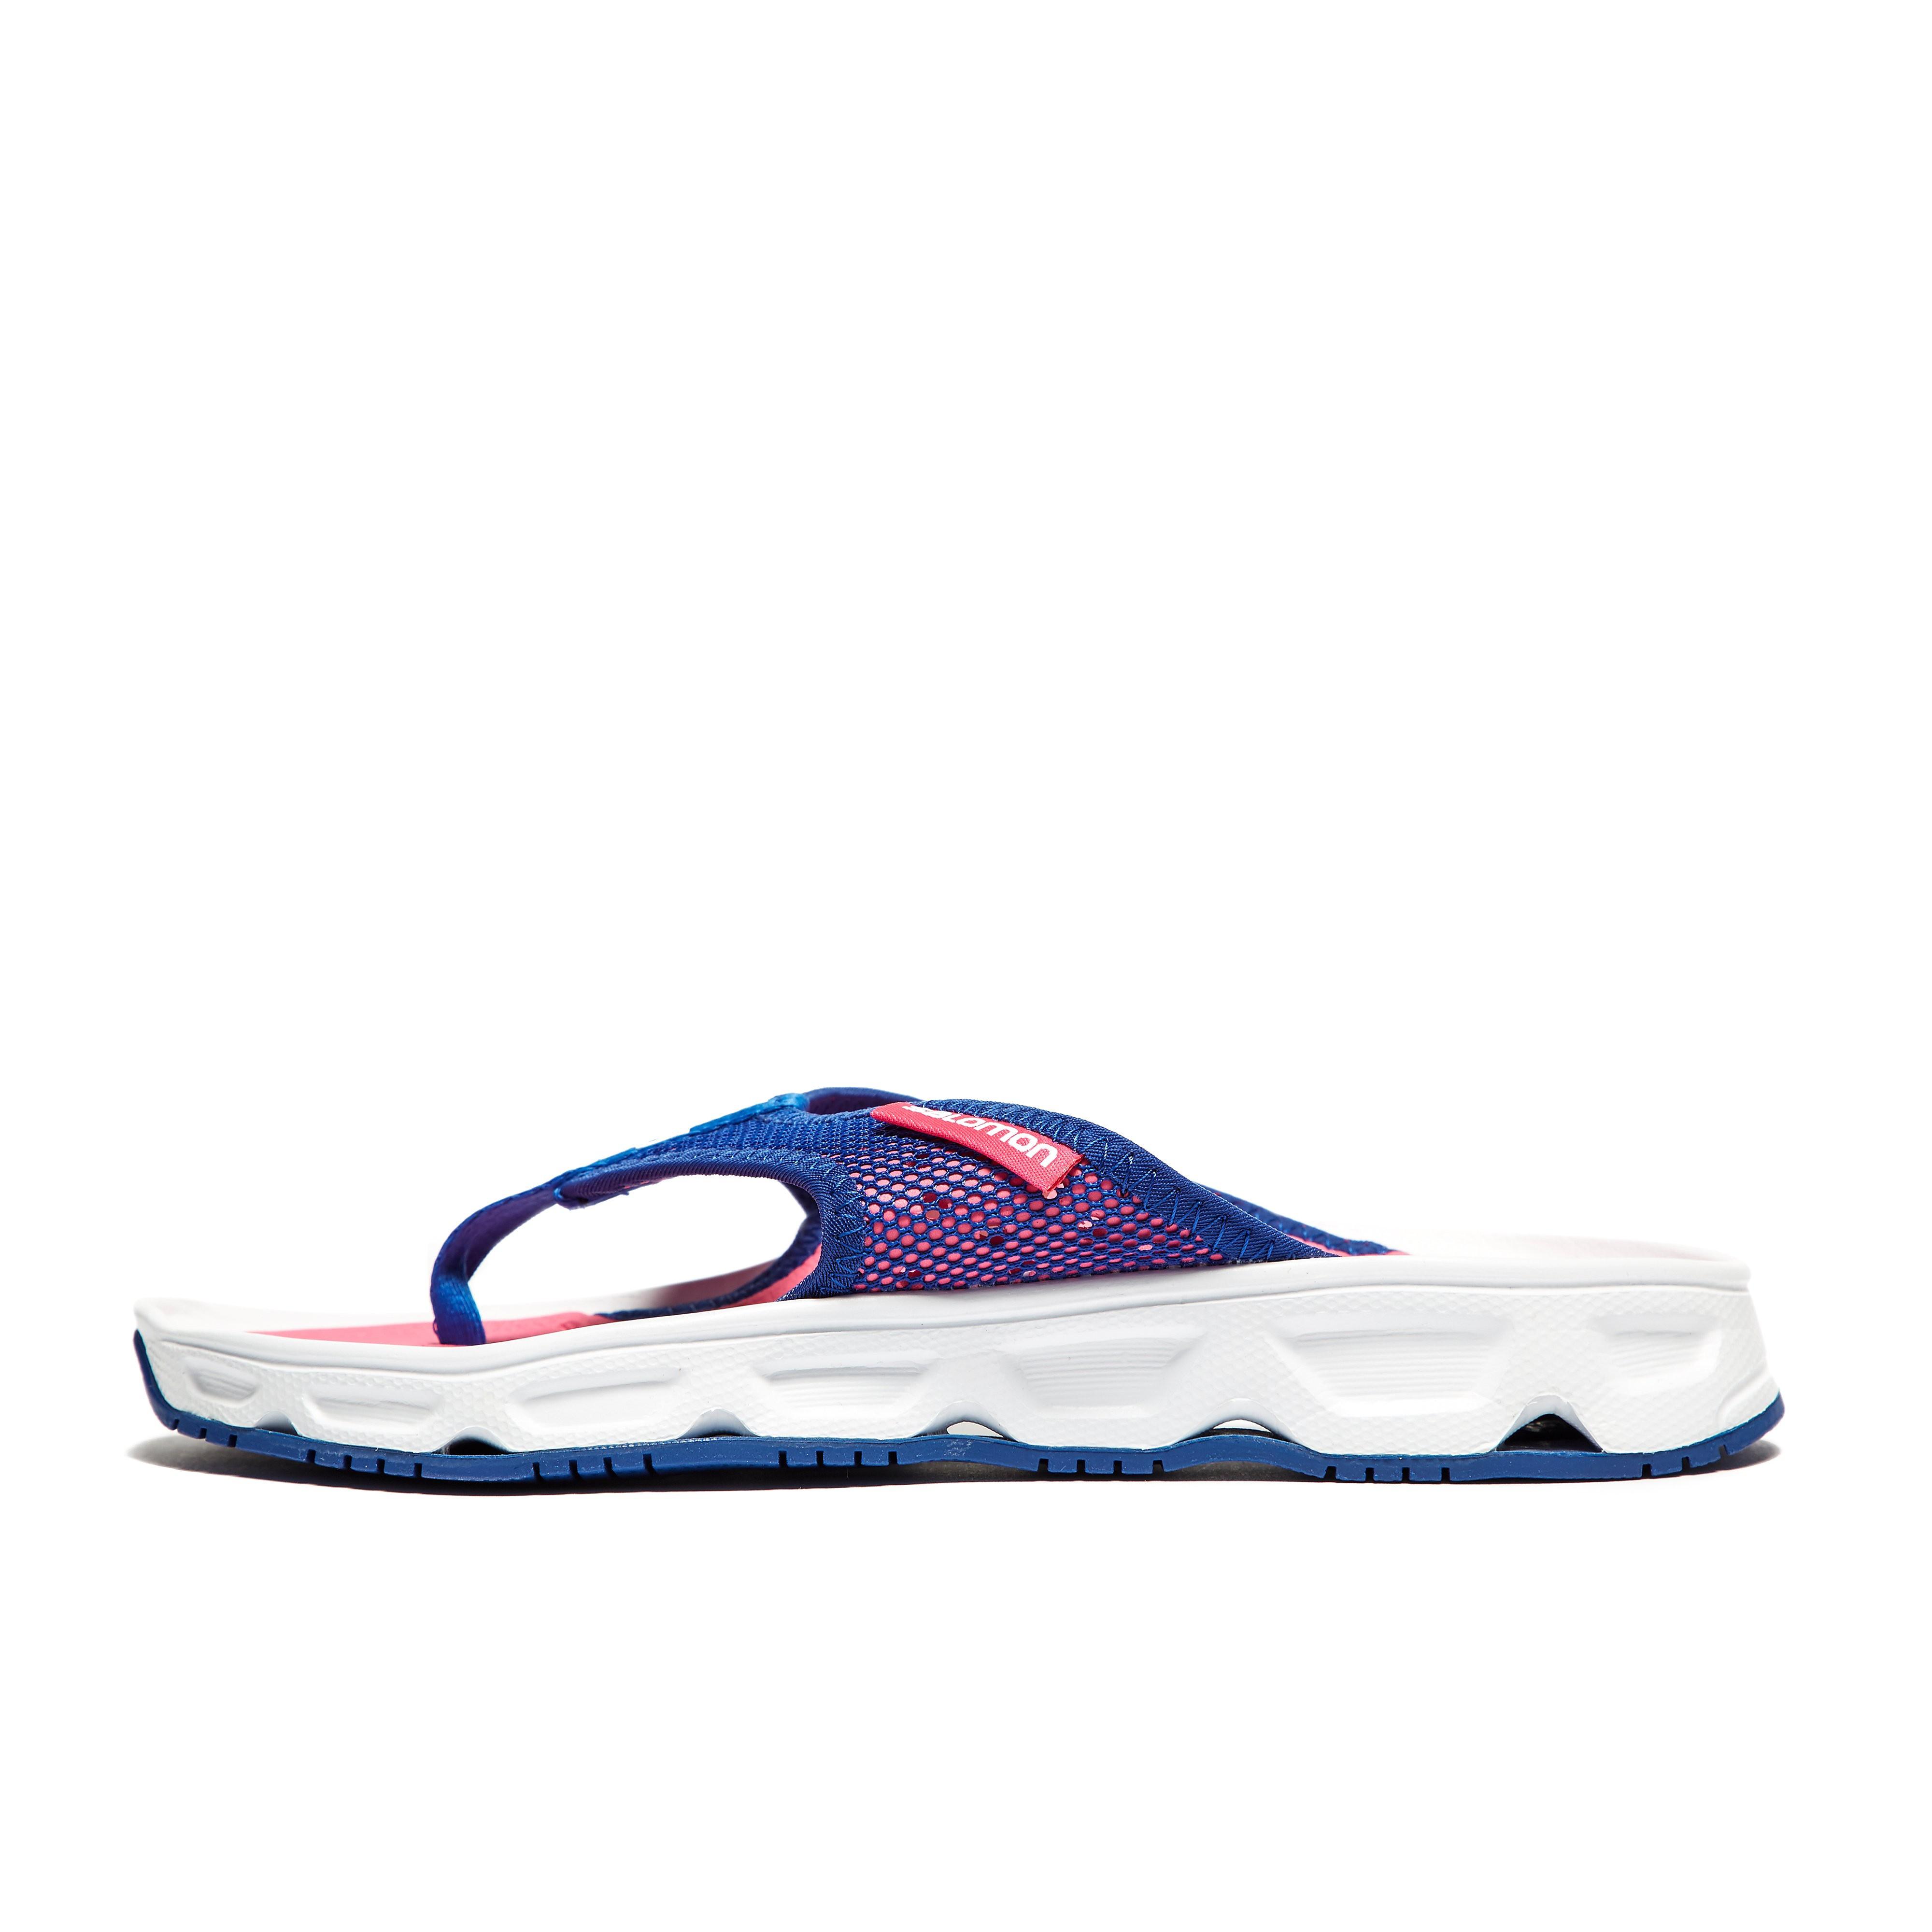 Salomon RX Break Women's Sandals